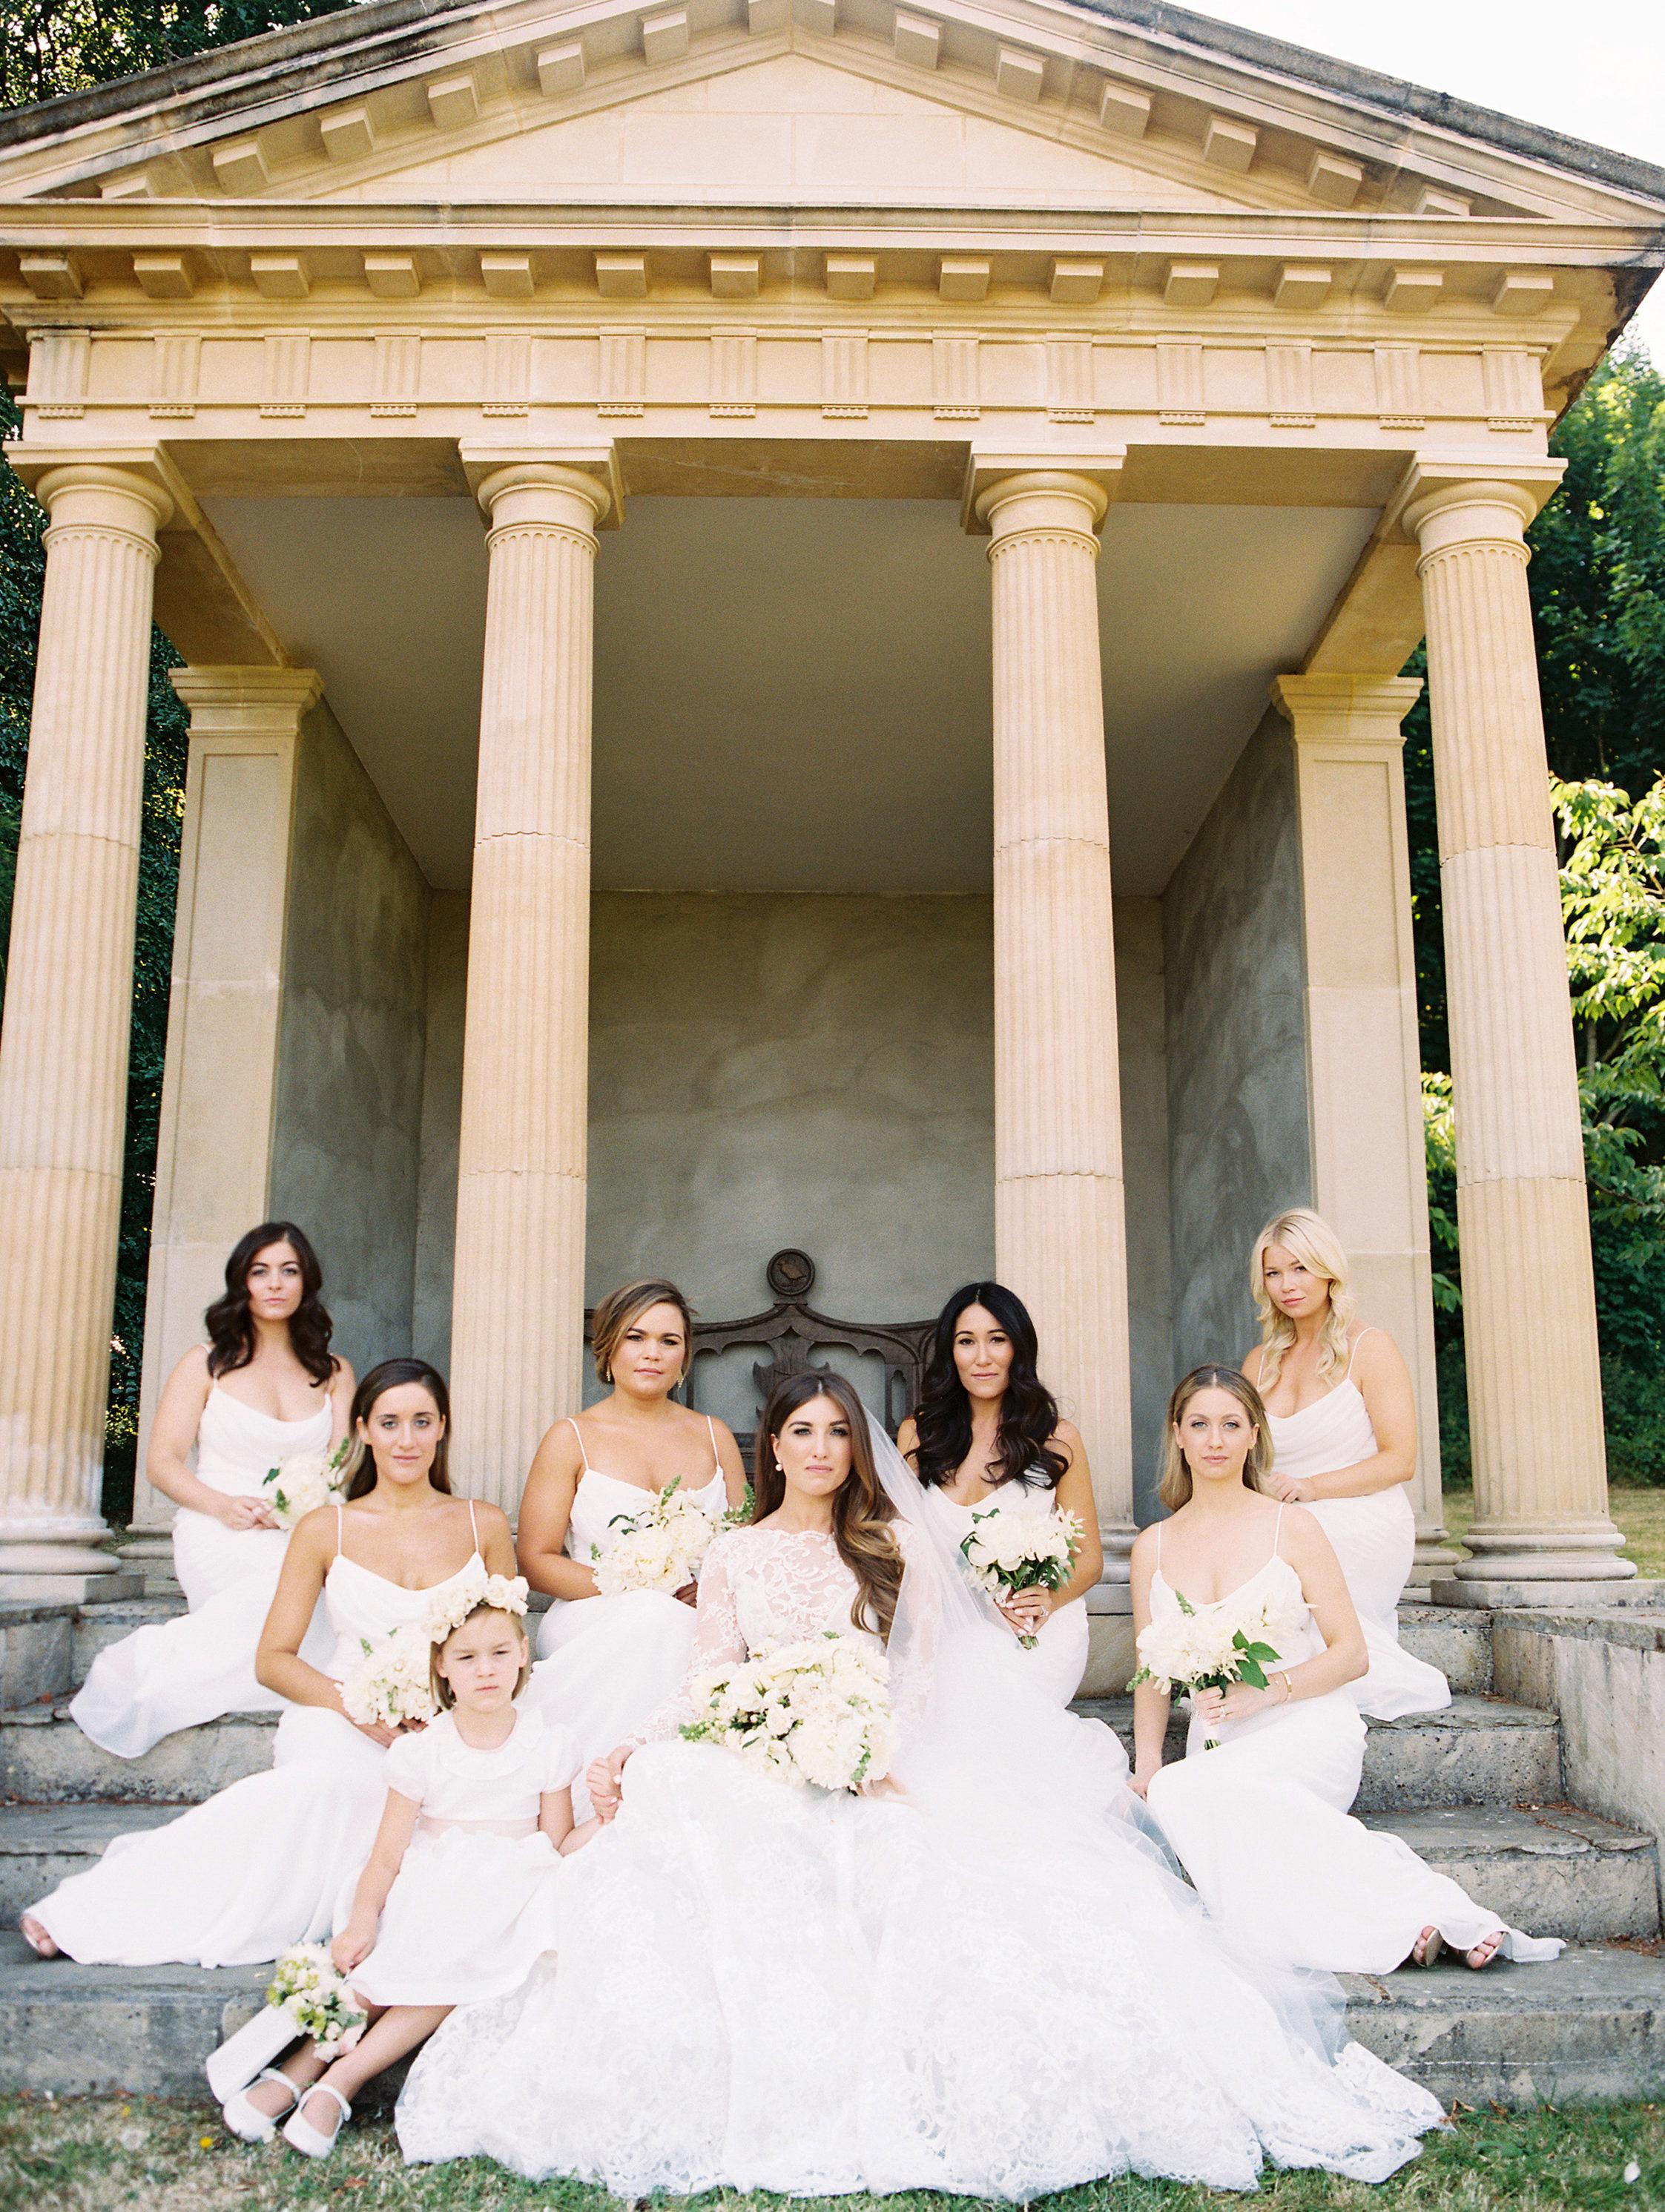 ramsey charles ireland wedding bridesmaids and bride on steps